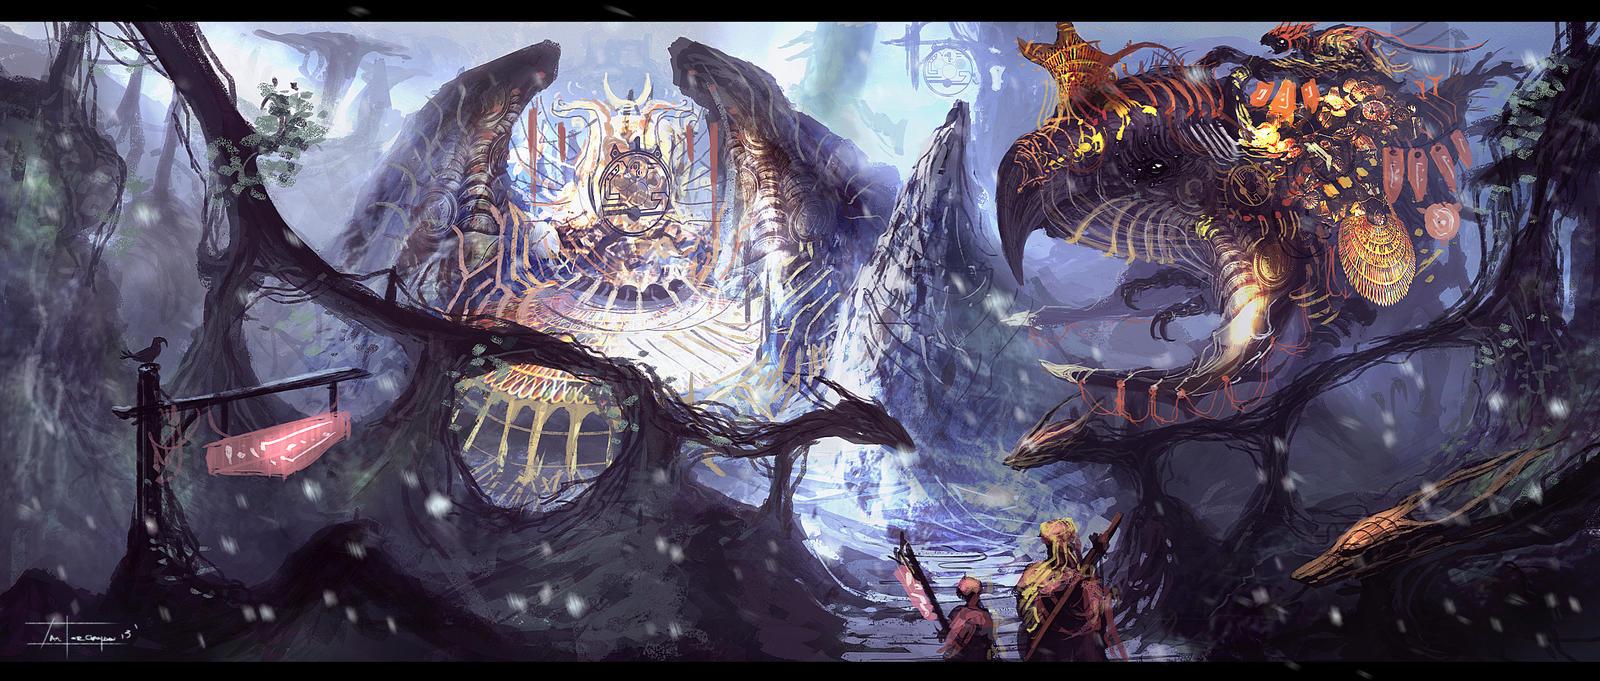 1-3-13 (fantasy) by zakforeman